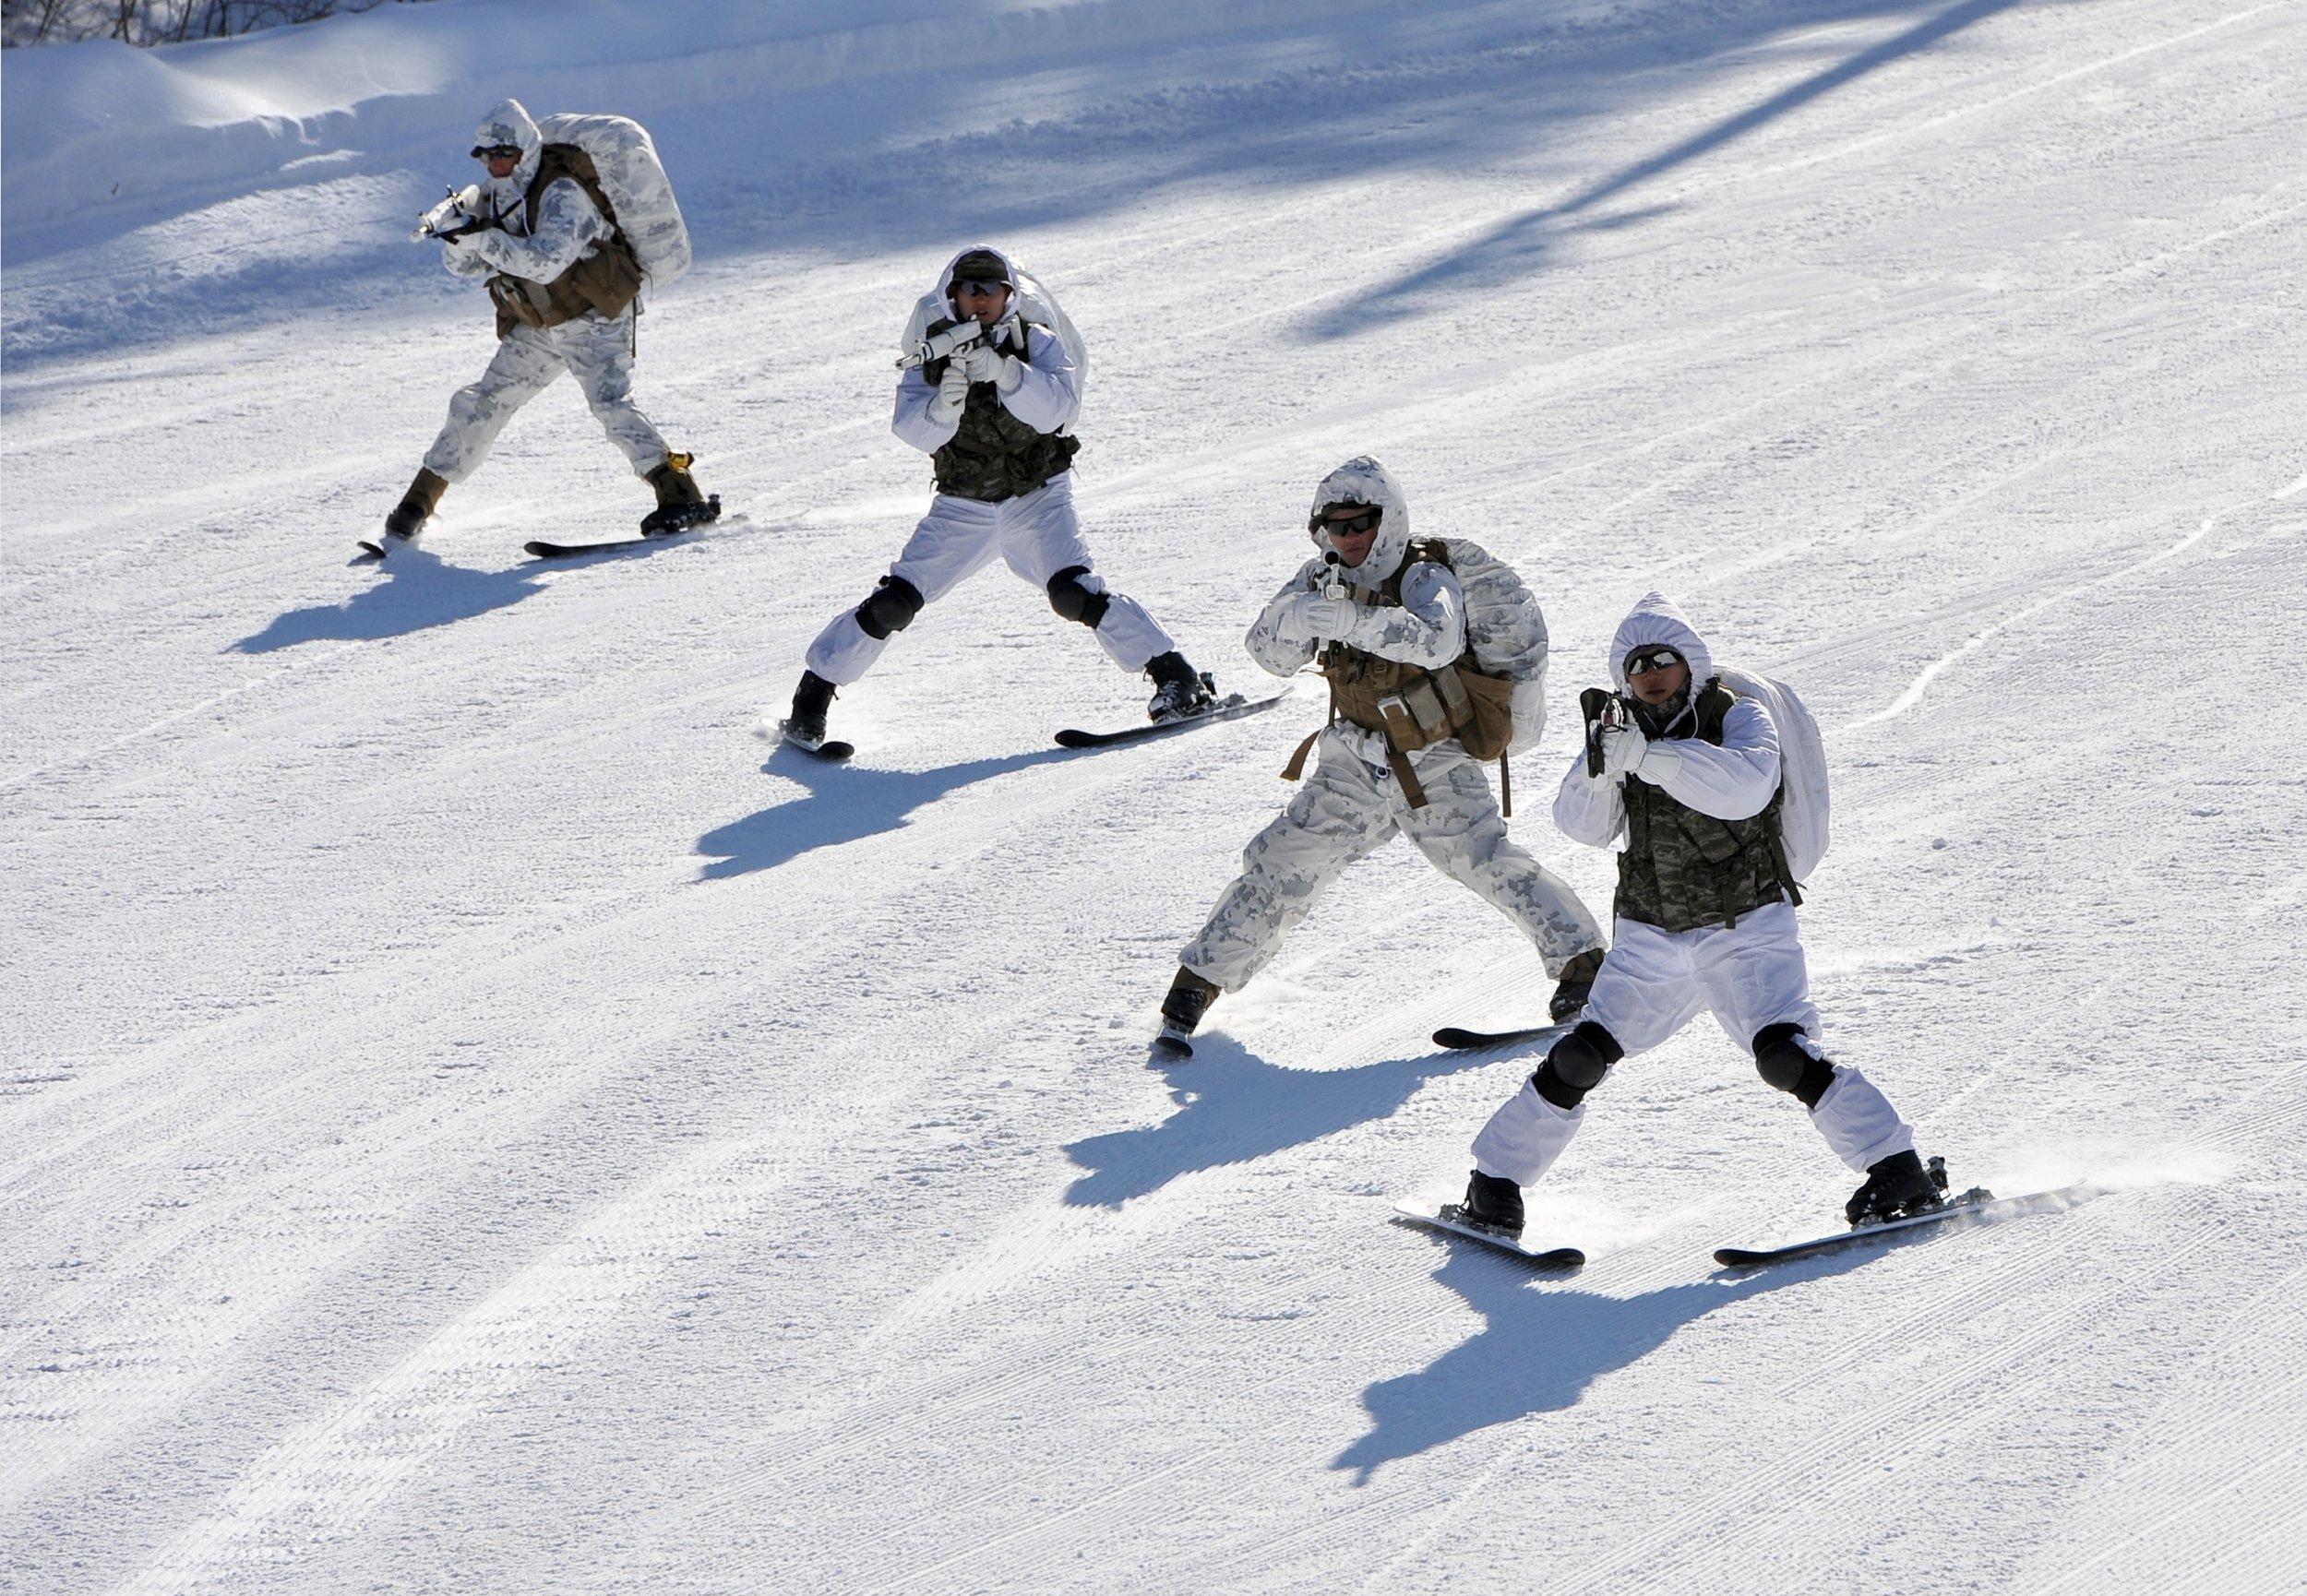 12_29_skis_US_military_Russia_North_Korea